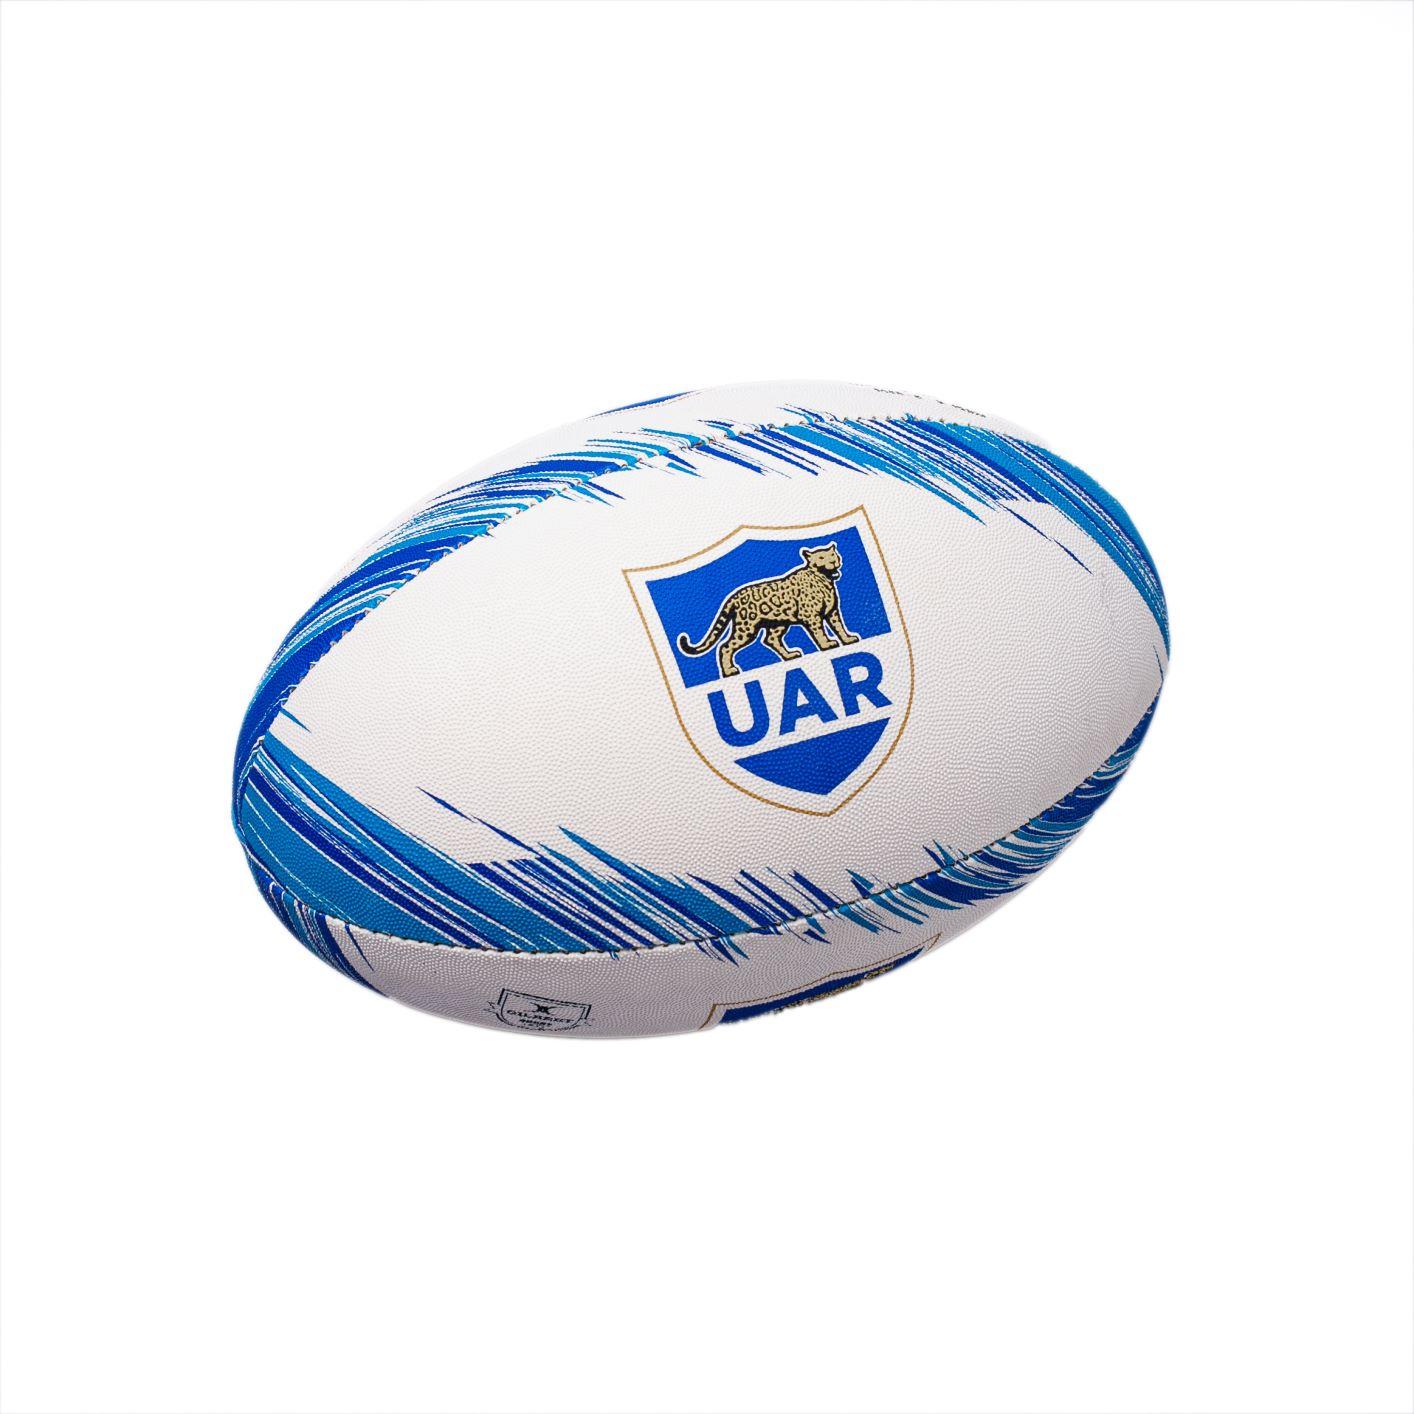 Bola de Rugby Gilbert Supporter Argentina - Tamanho 5